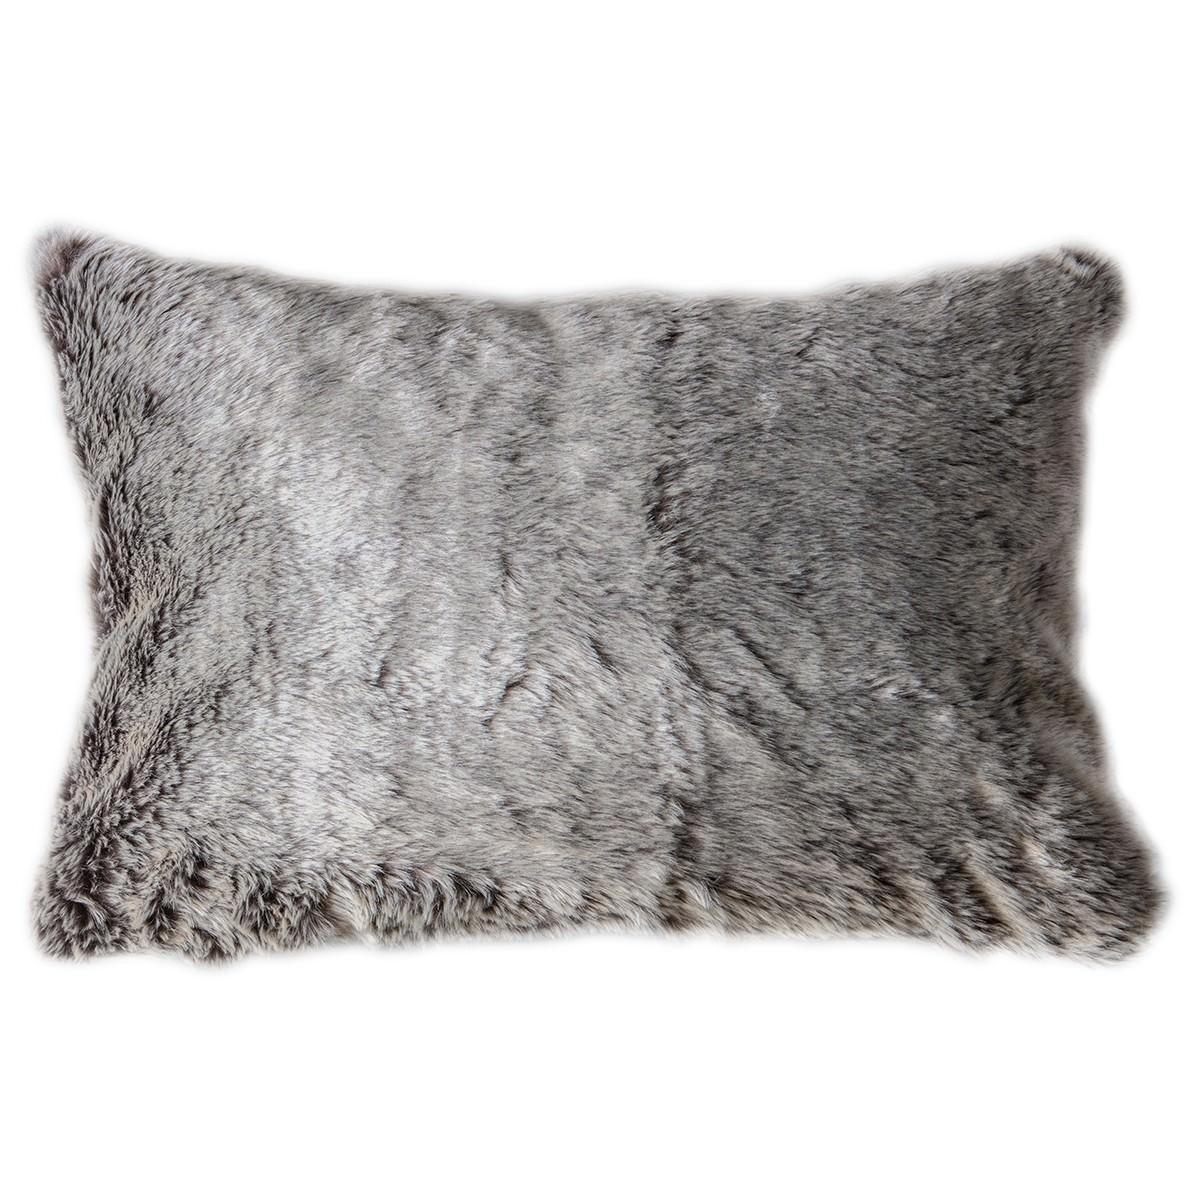 Eskimo Wolf Faux Fur Lumbar Cushion, Chocolate